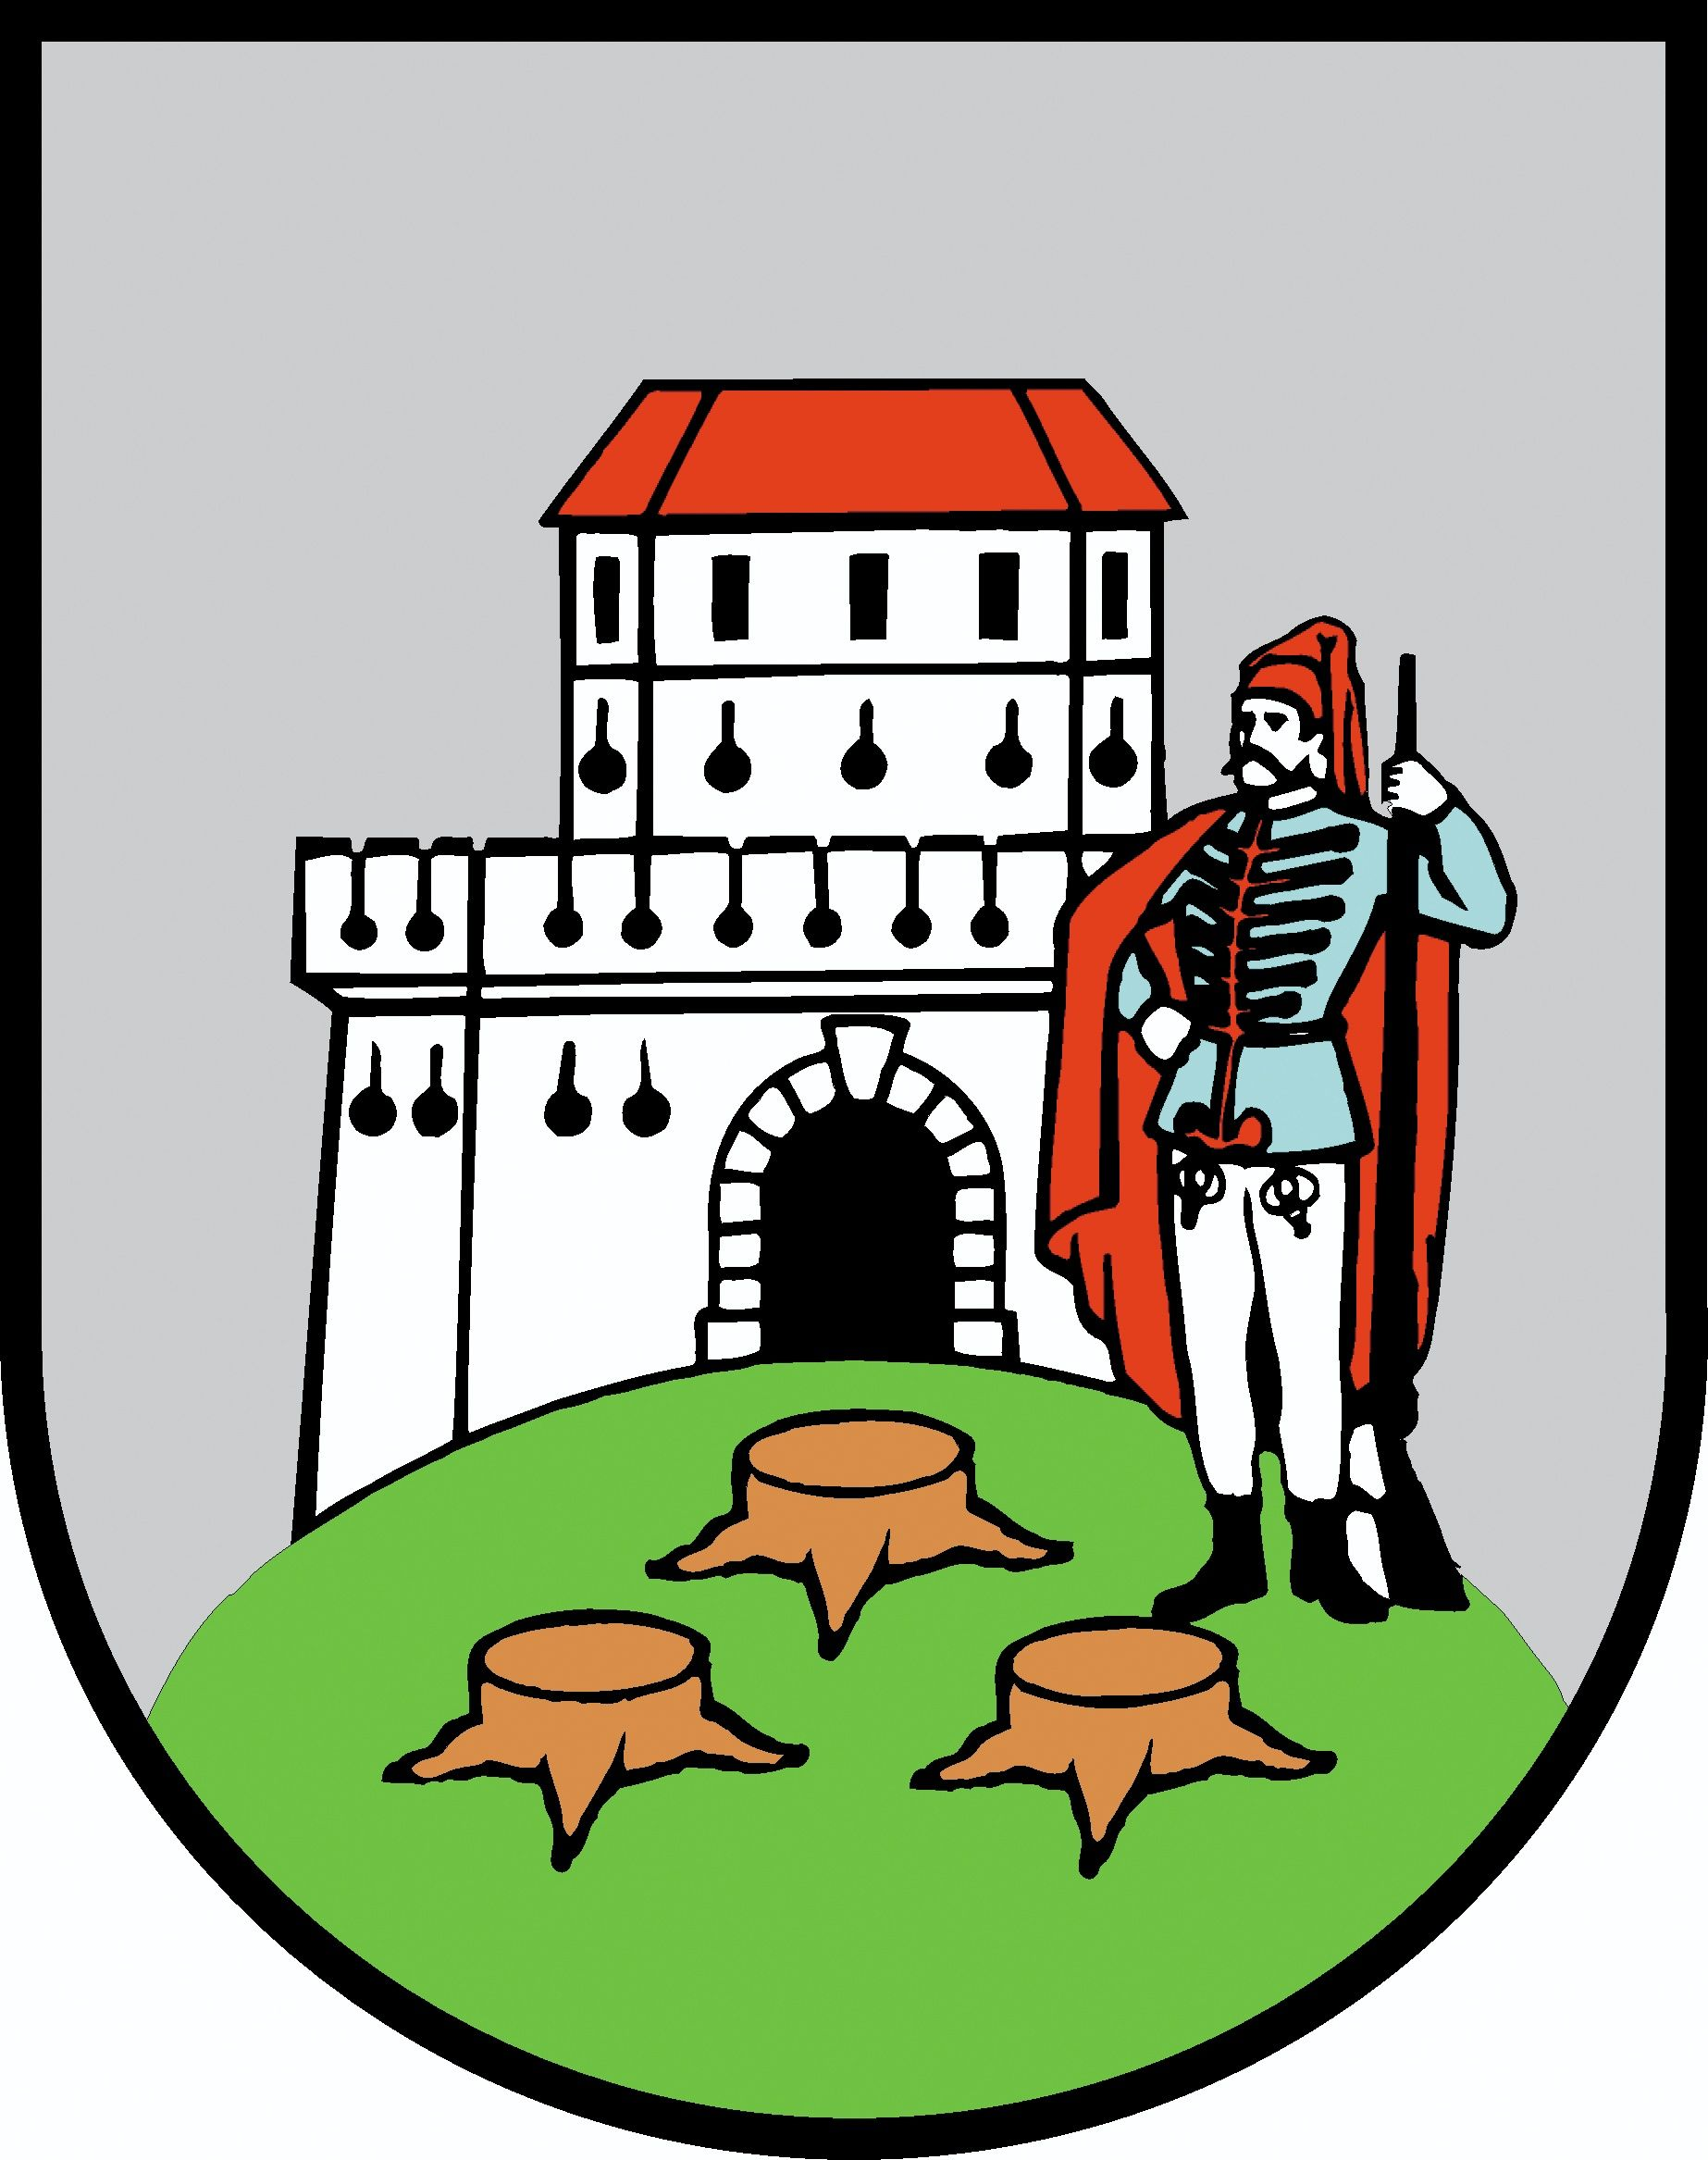 Grb Grada Bjelovara